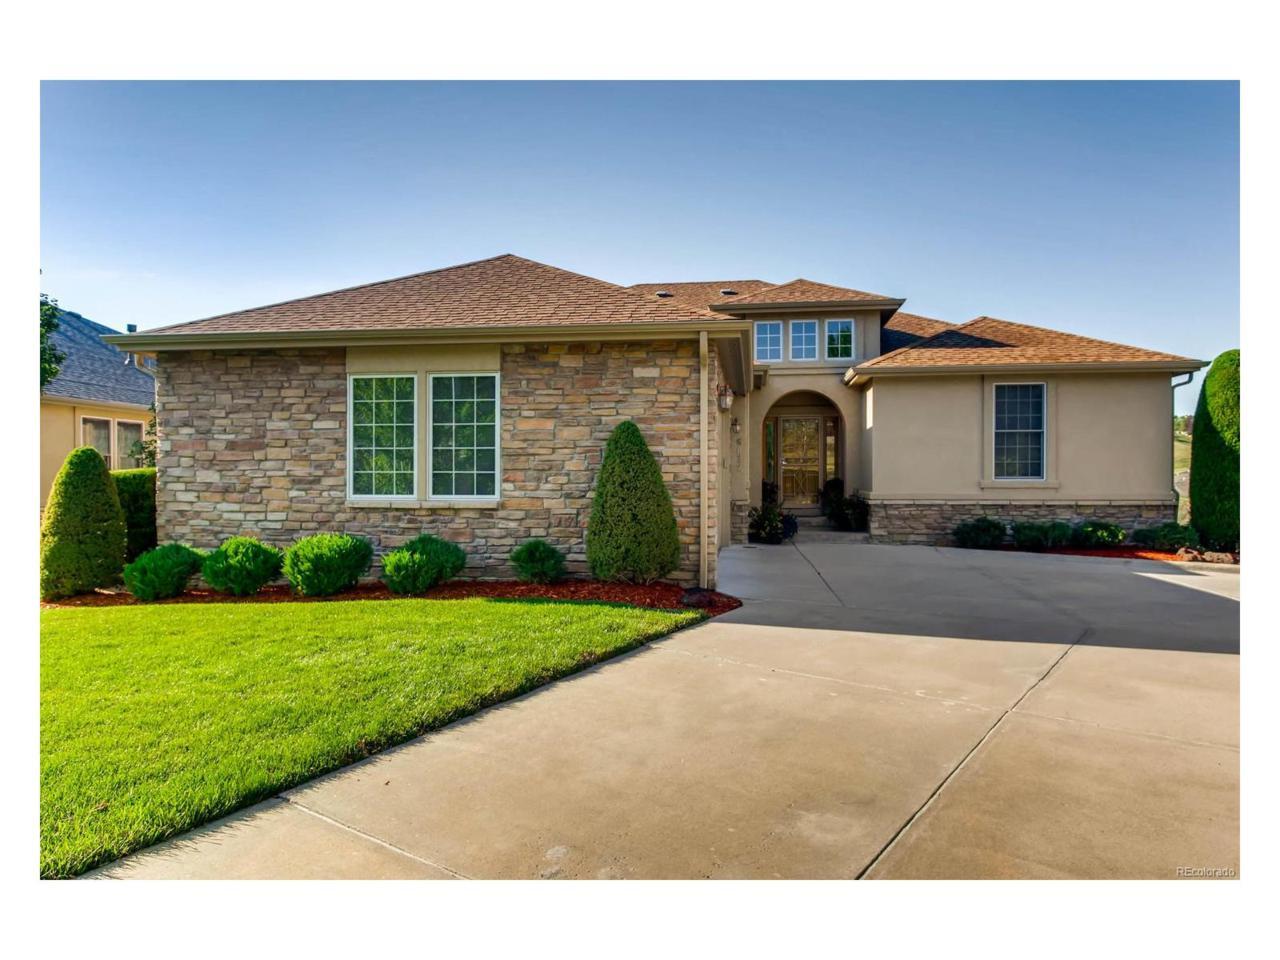 6832 S Routt Street, Littleton, CO 80127 (MLS #9279340) :: 8z Real Estate